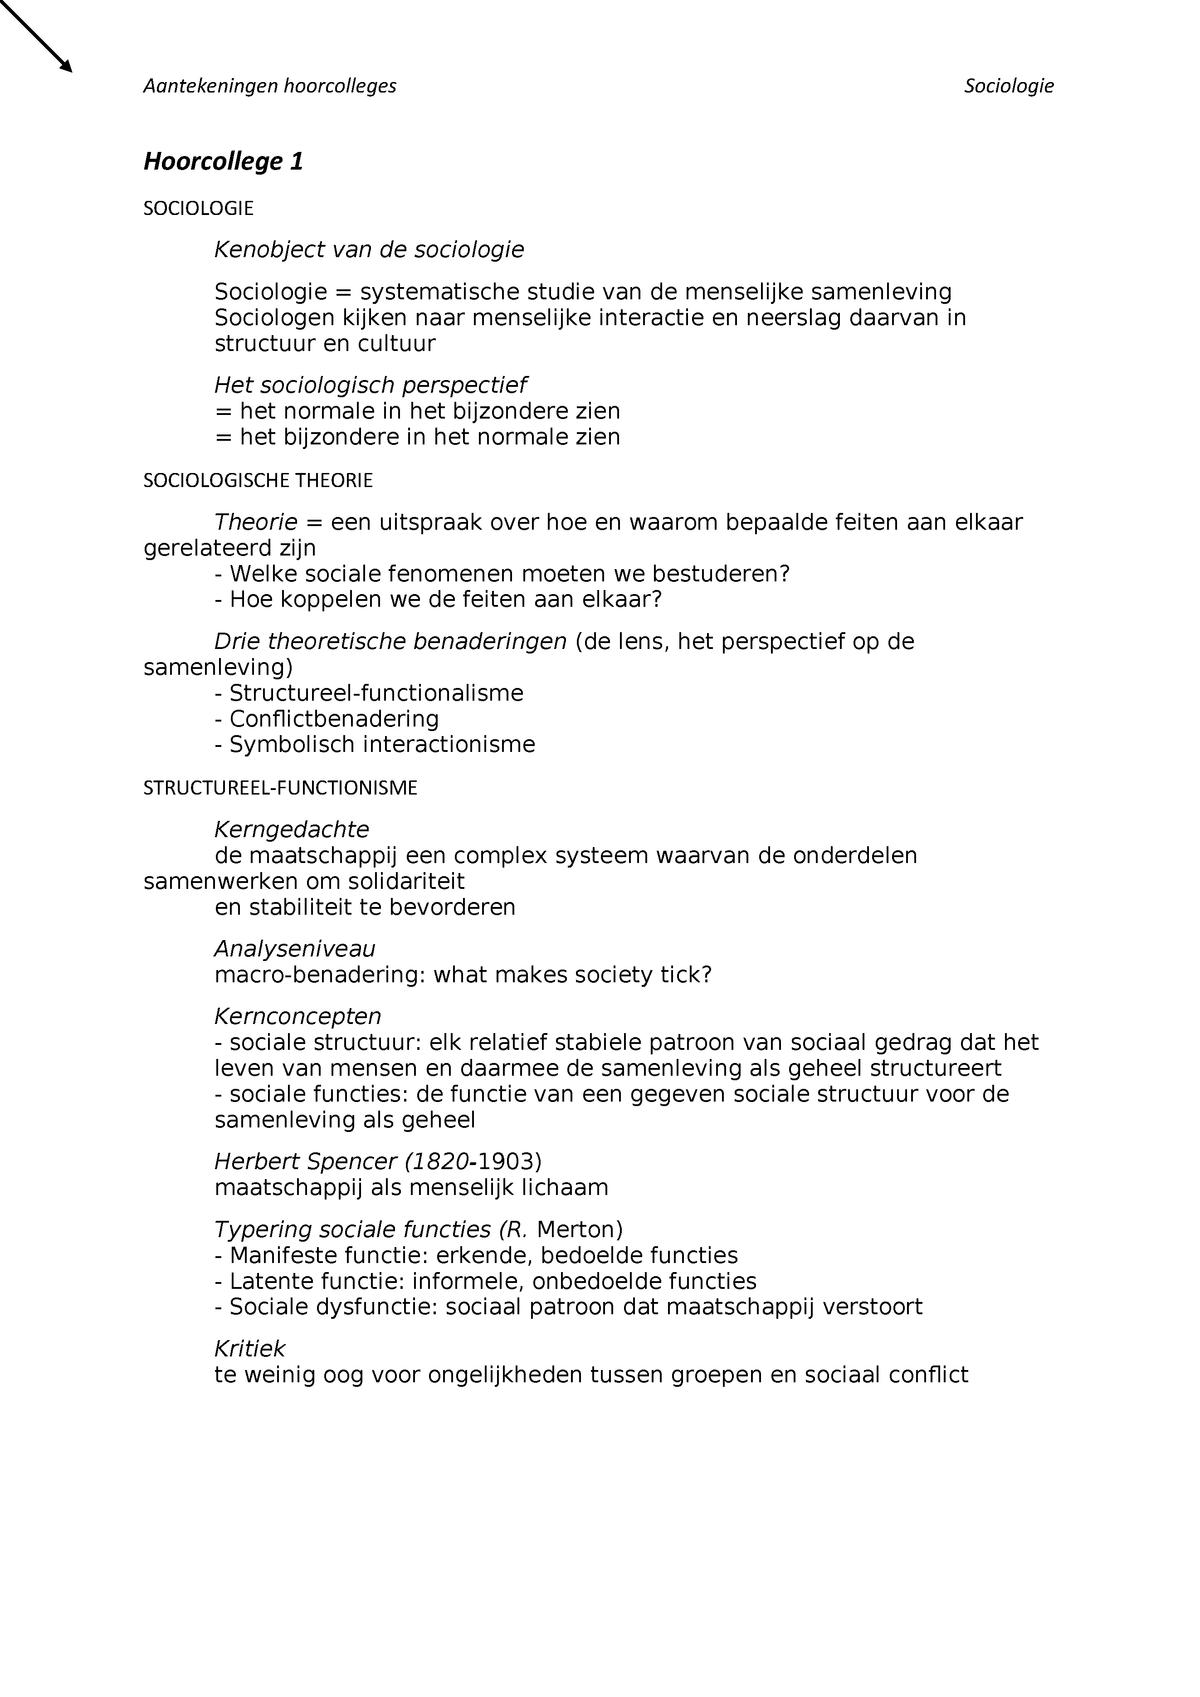 Functies van dating sociologie